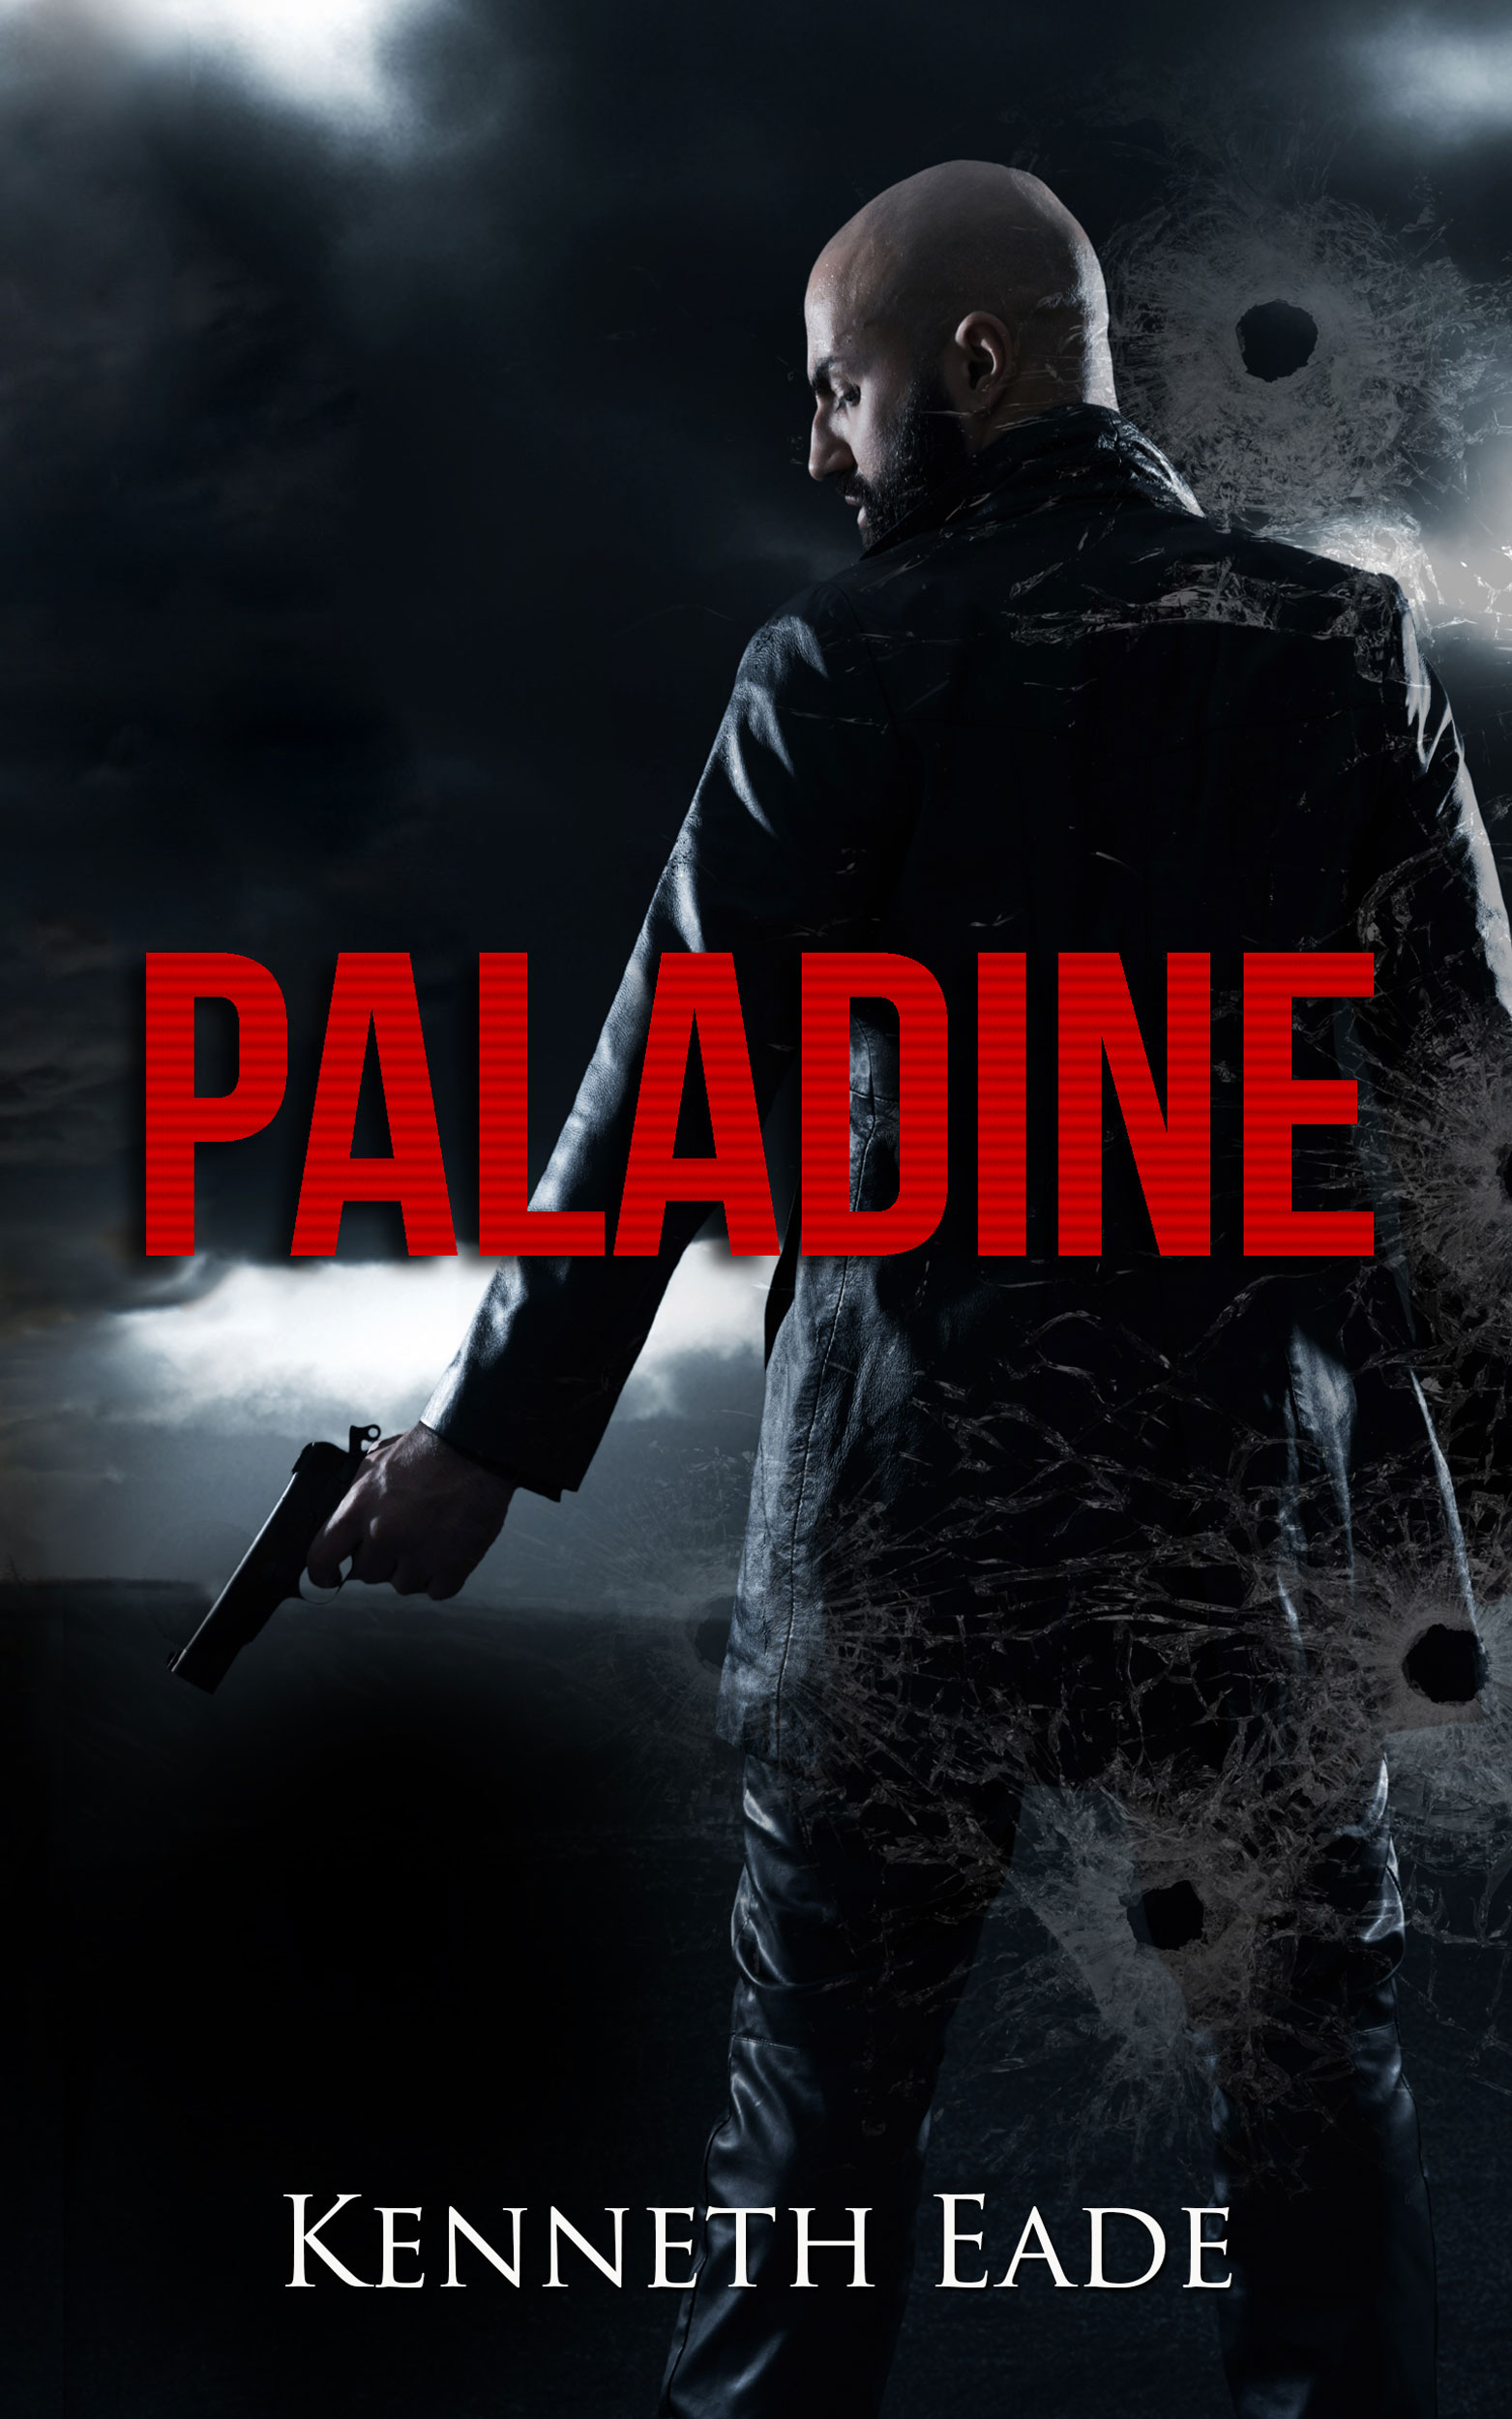 Paladine by Kenneth Eade